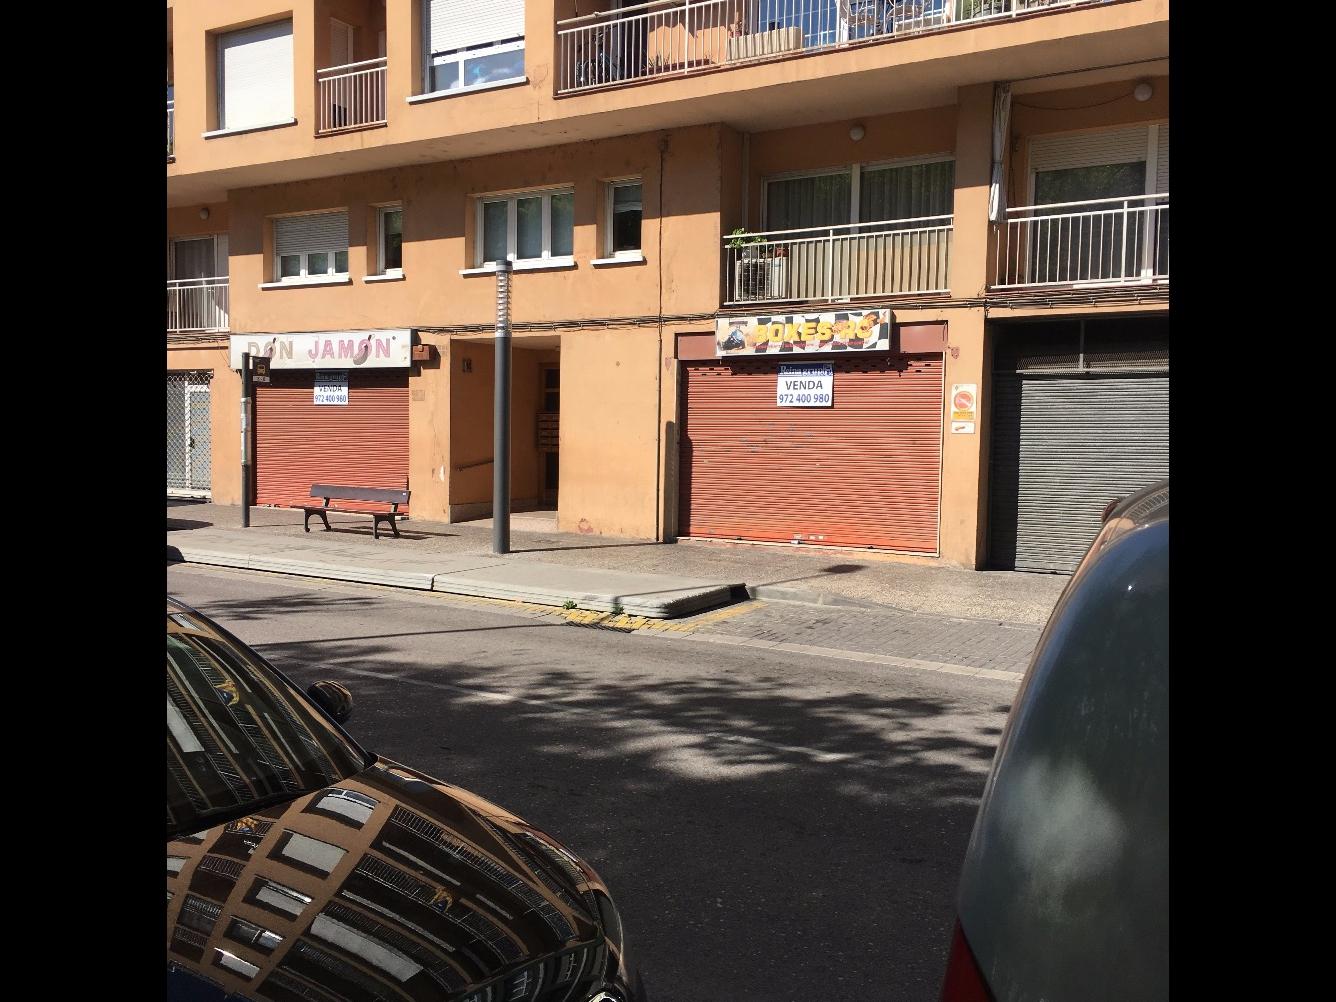 Alquiler Local Comercial  Girona capital - santa eugènia. Oferta local  110m2 comercial a apartir de 75.000.-eu